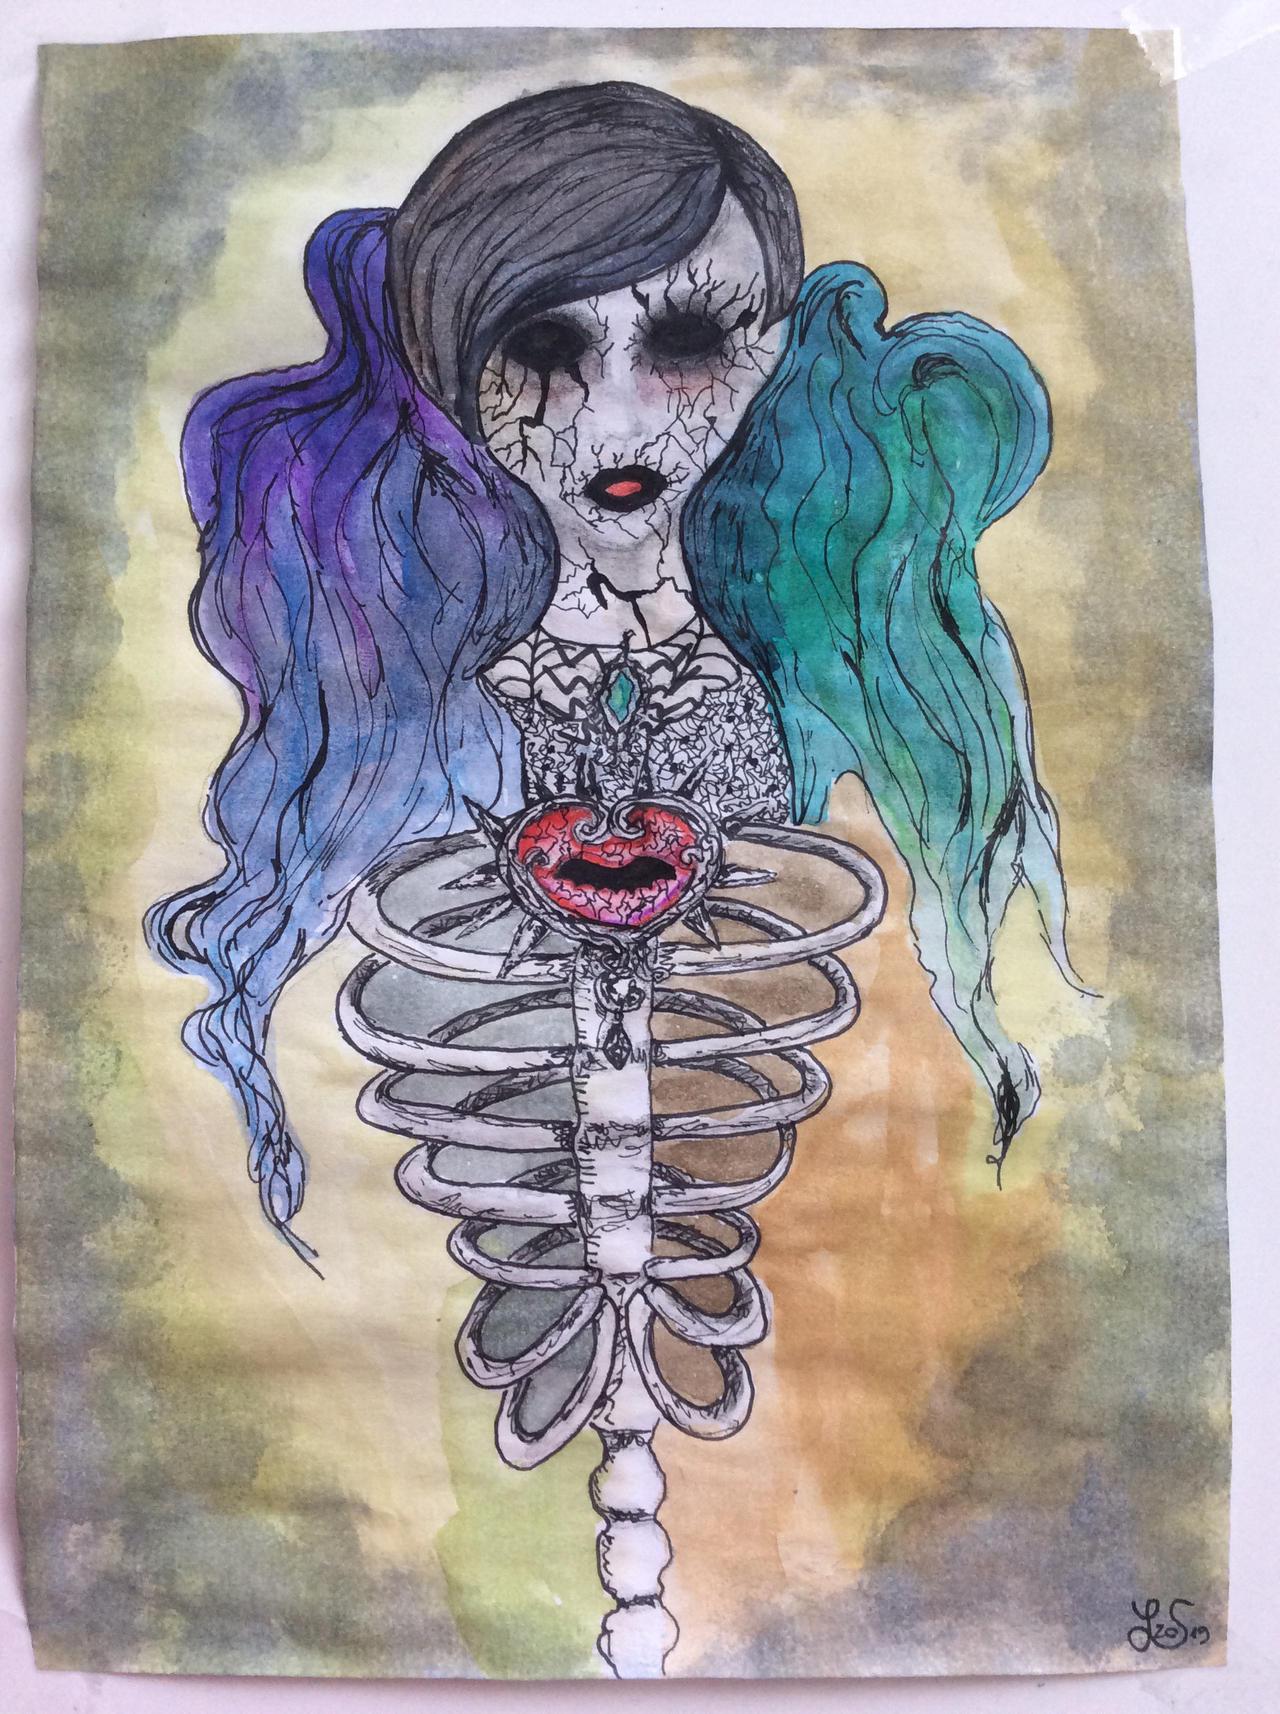 Strange pastel goth/ creepy cute Skullbeing